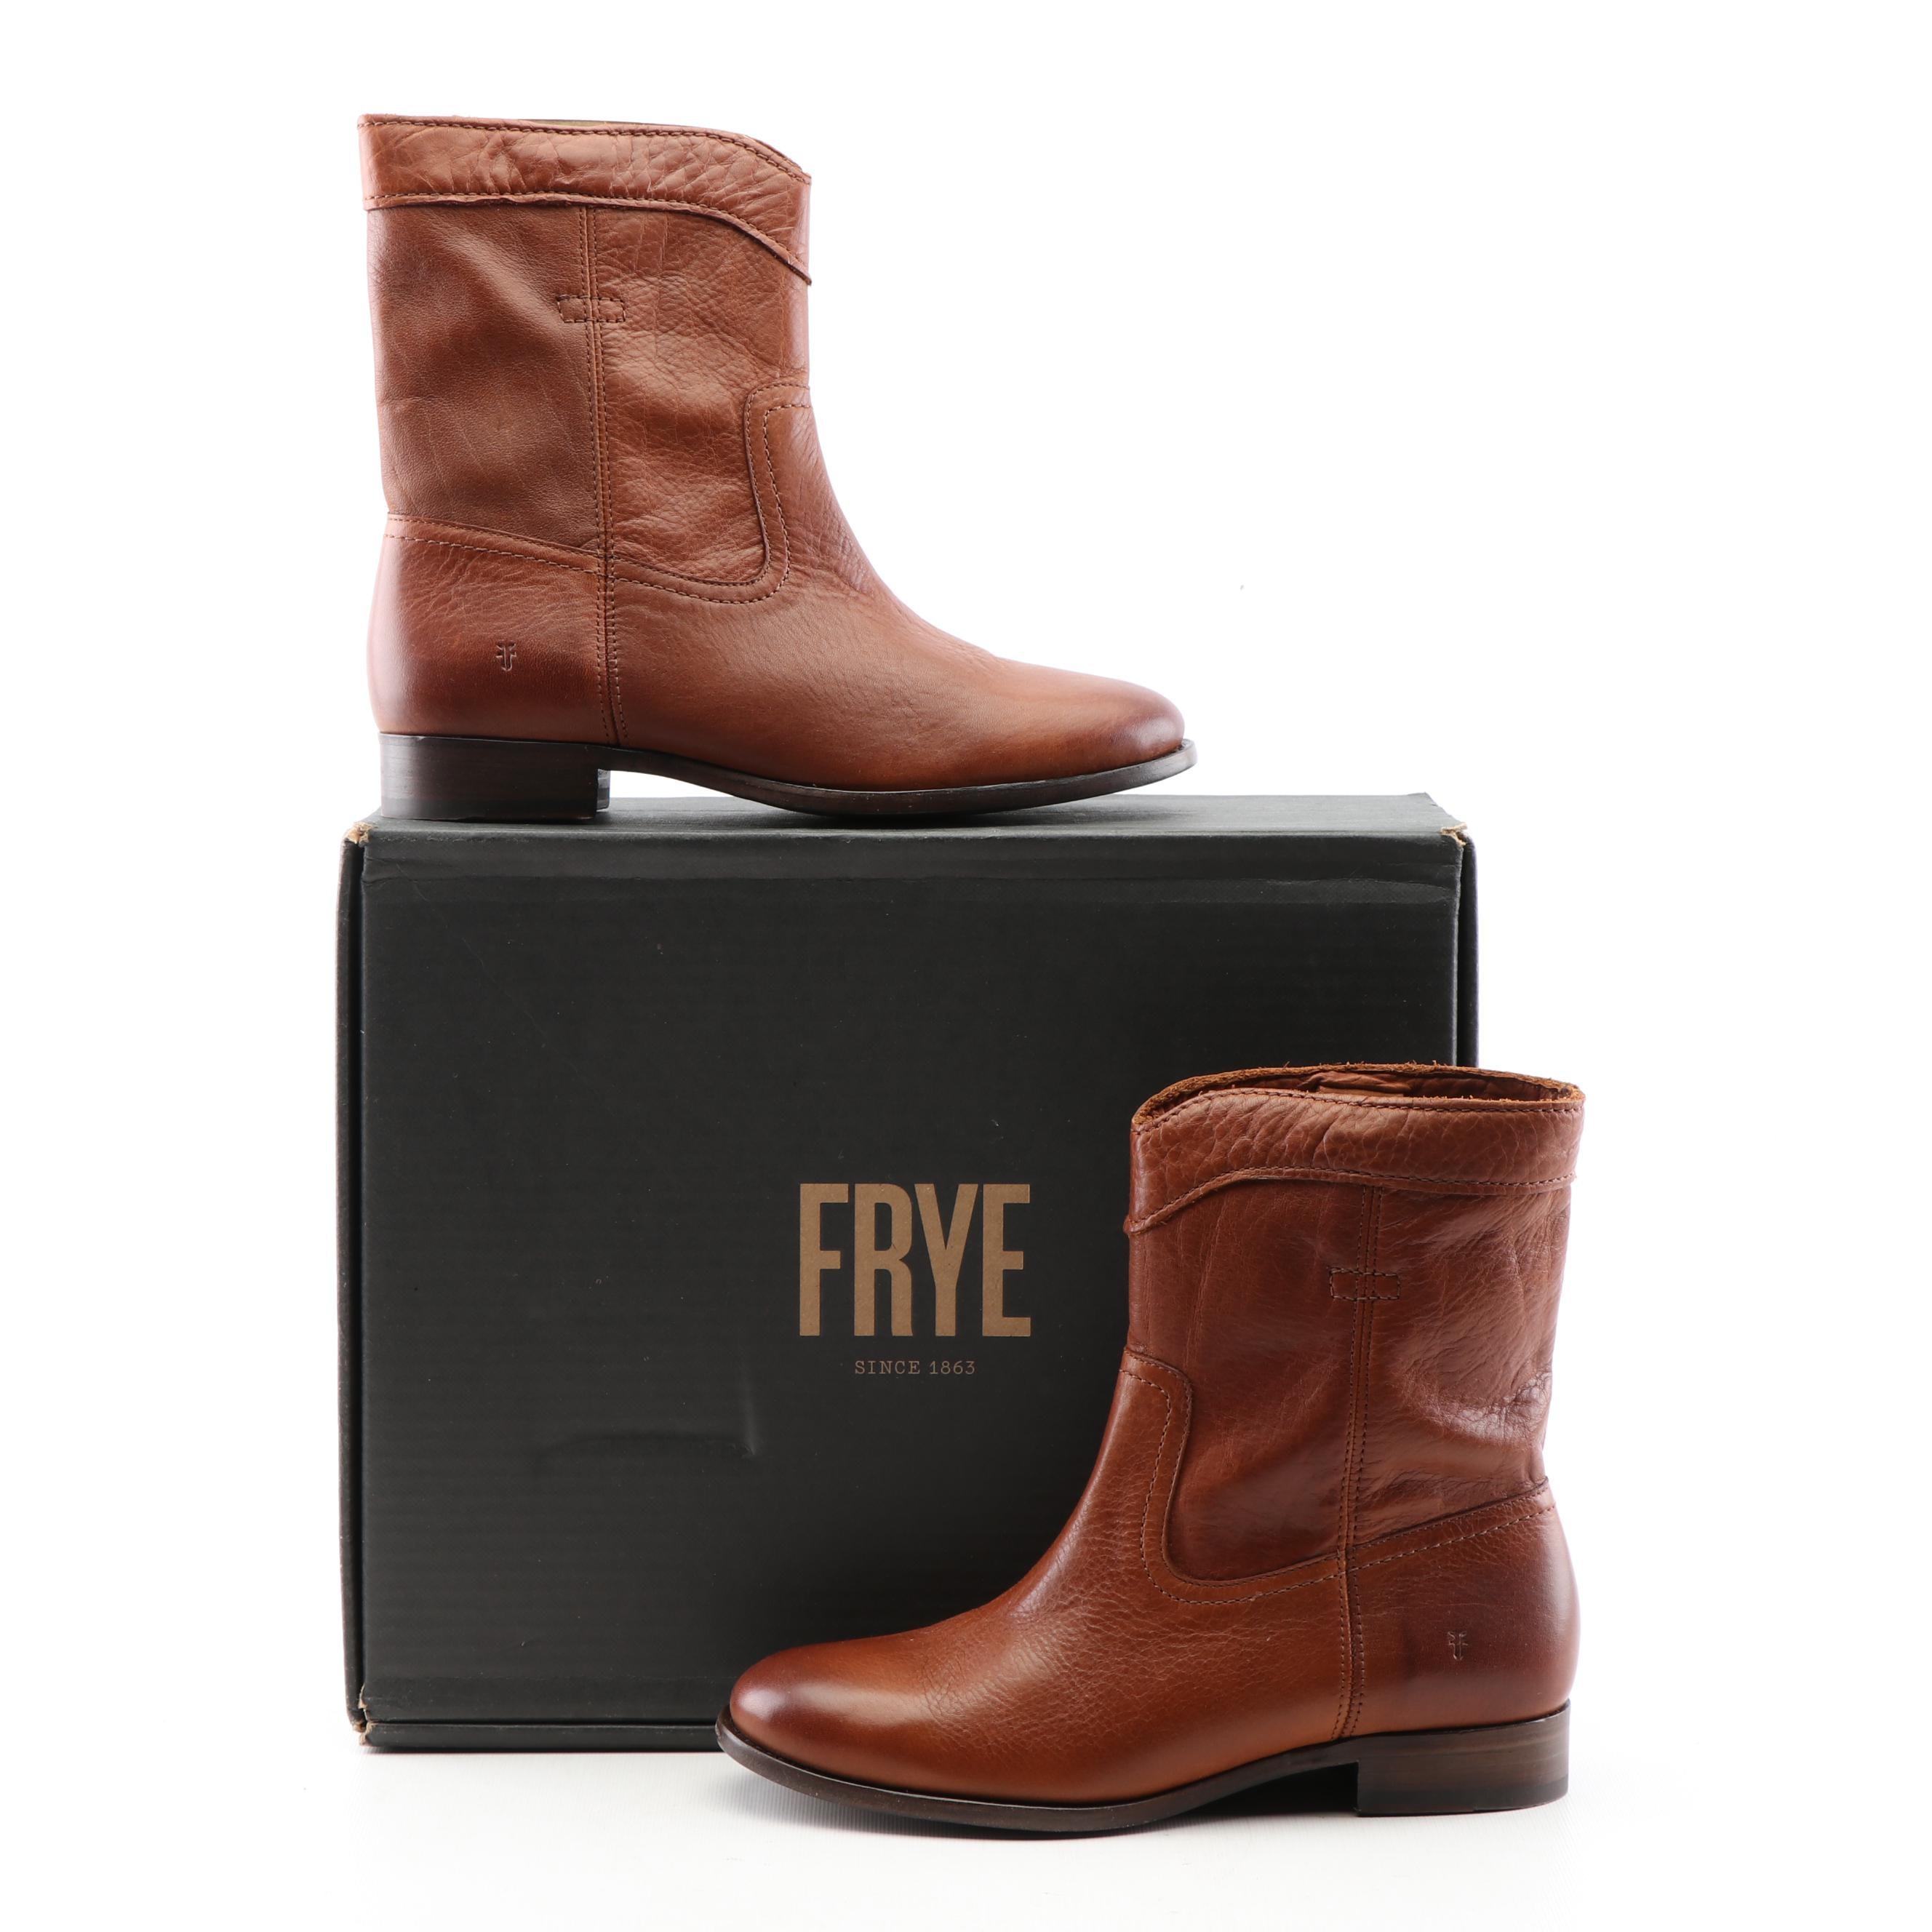 Frye Cara Roper Short Cognac Leather Boots